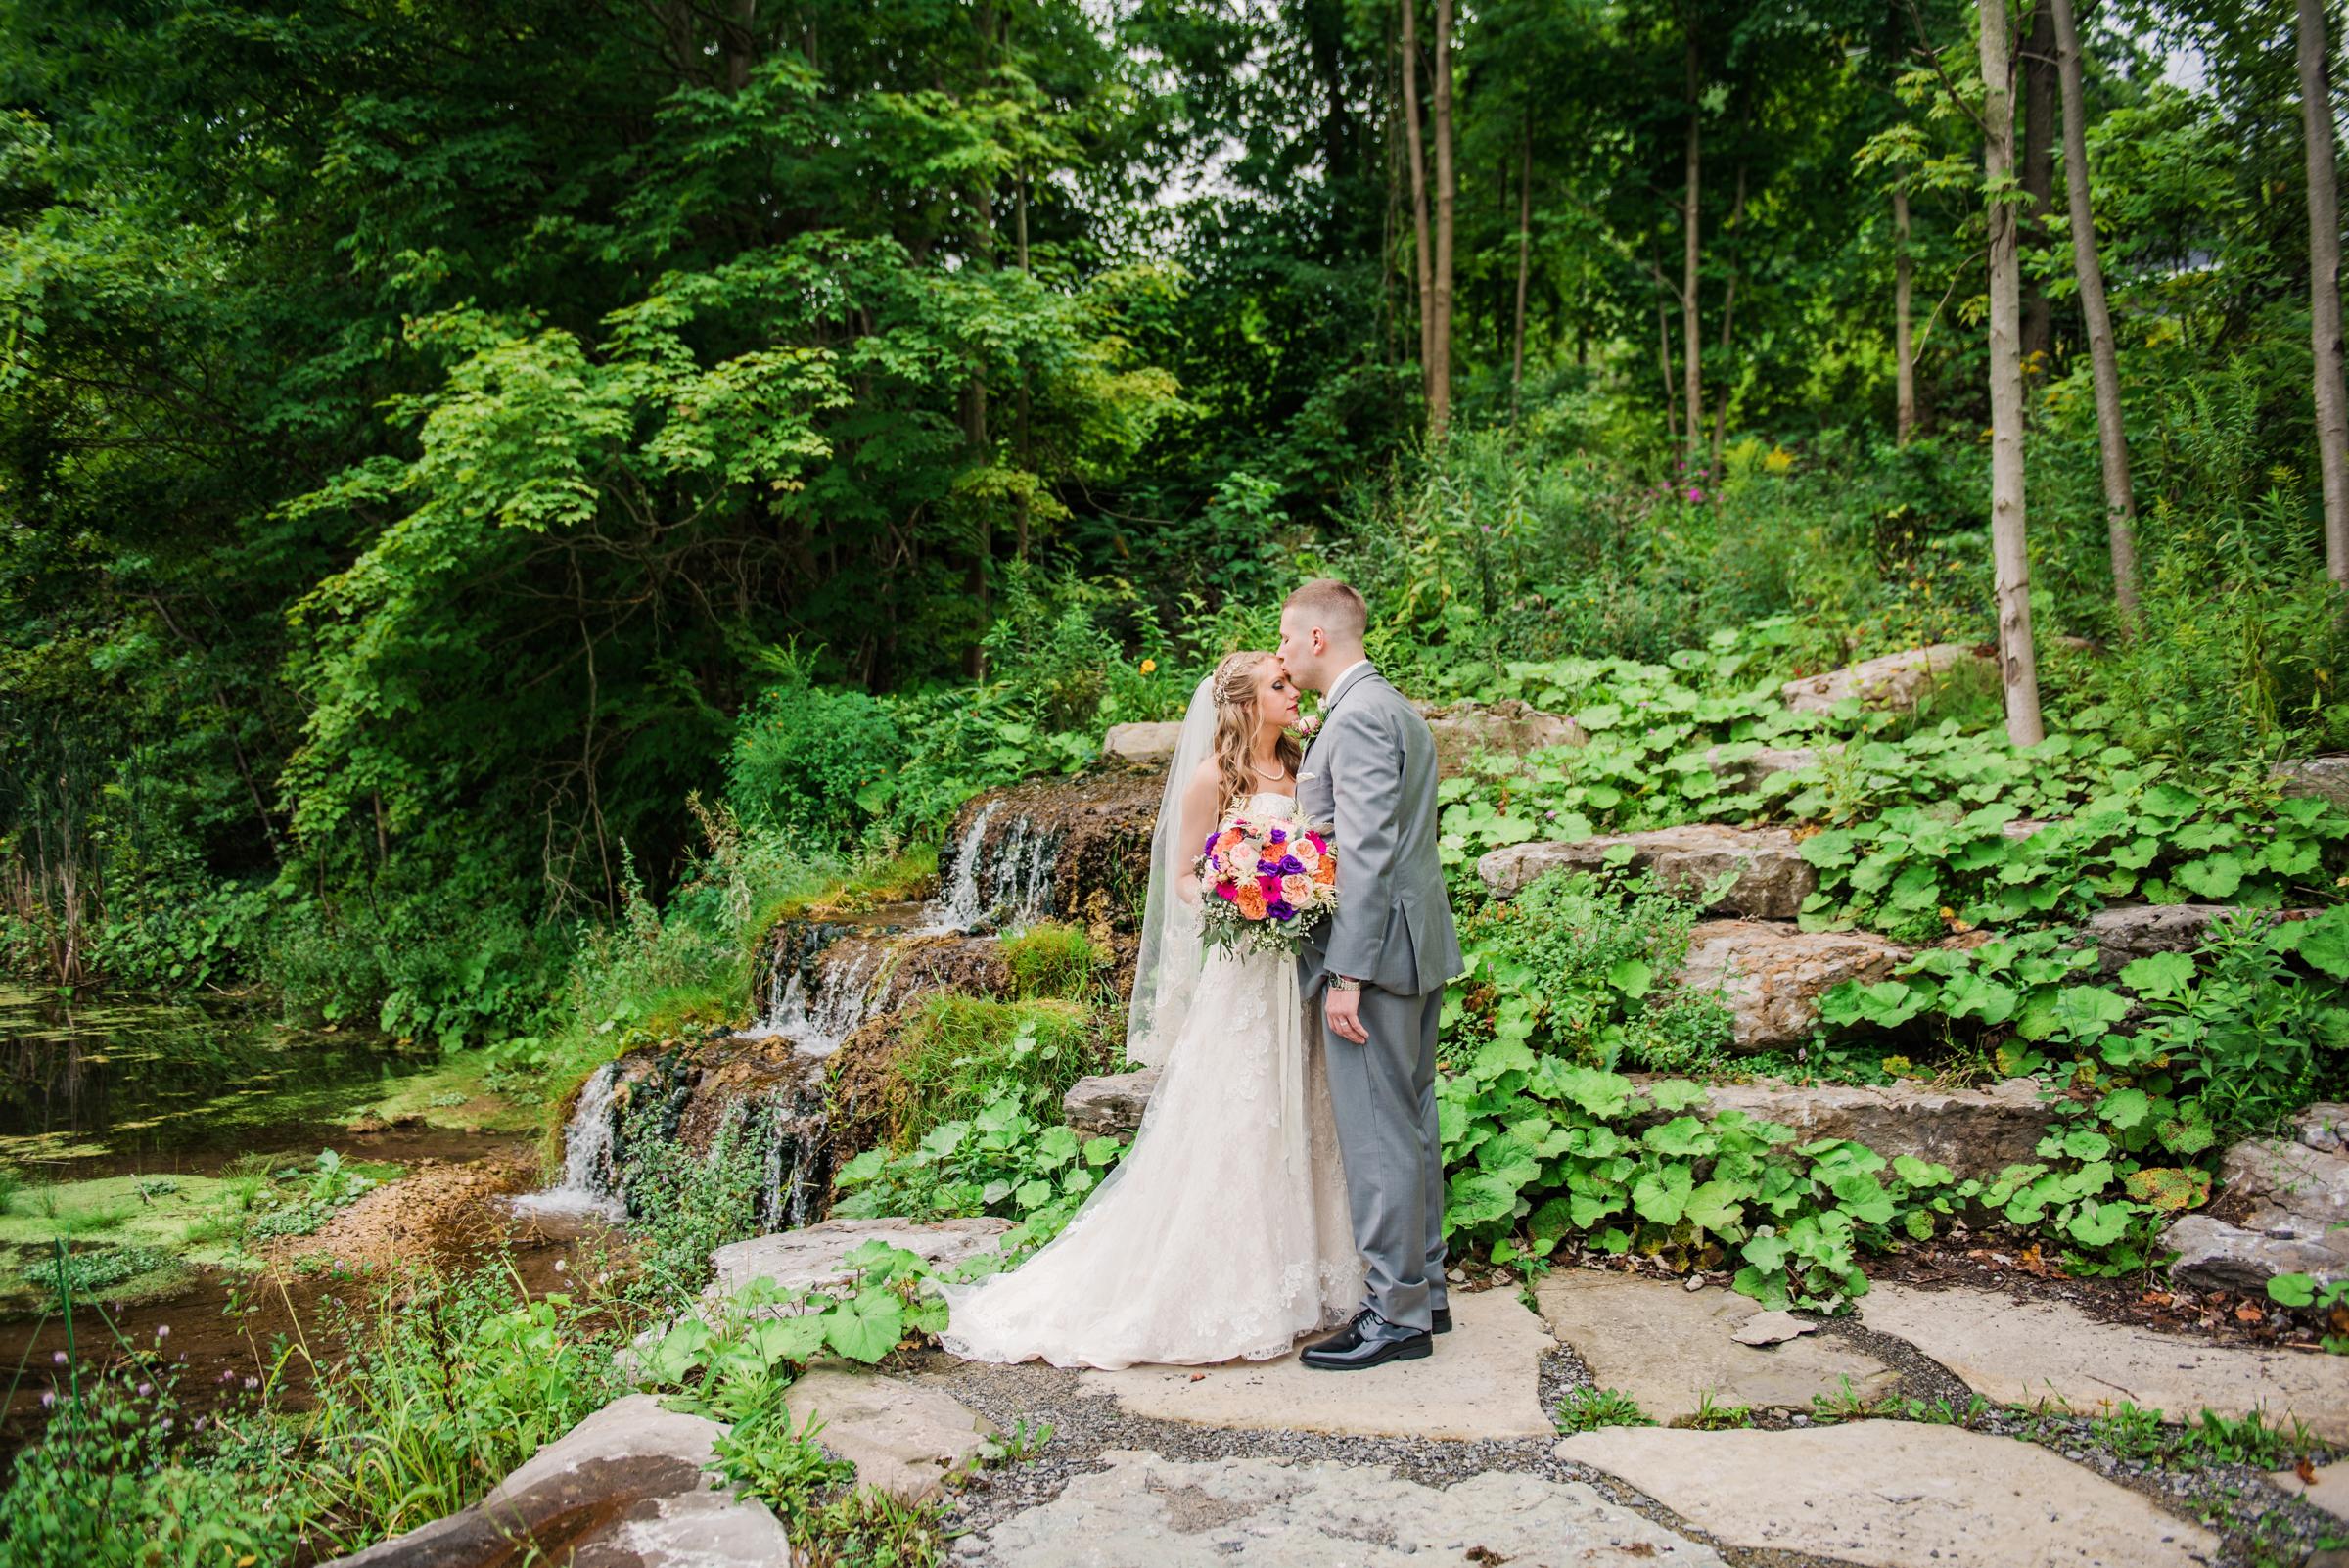 Wolf_Oak_Acres_Central_NY_Wedding_JILL_STUDIO_Rochester_NY_Photographer_DSC_8693.jpg